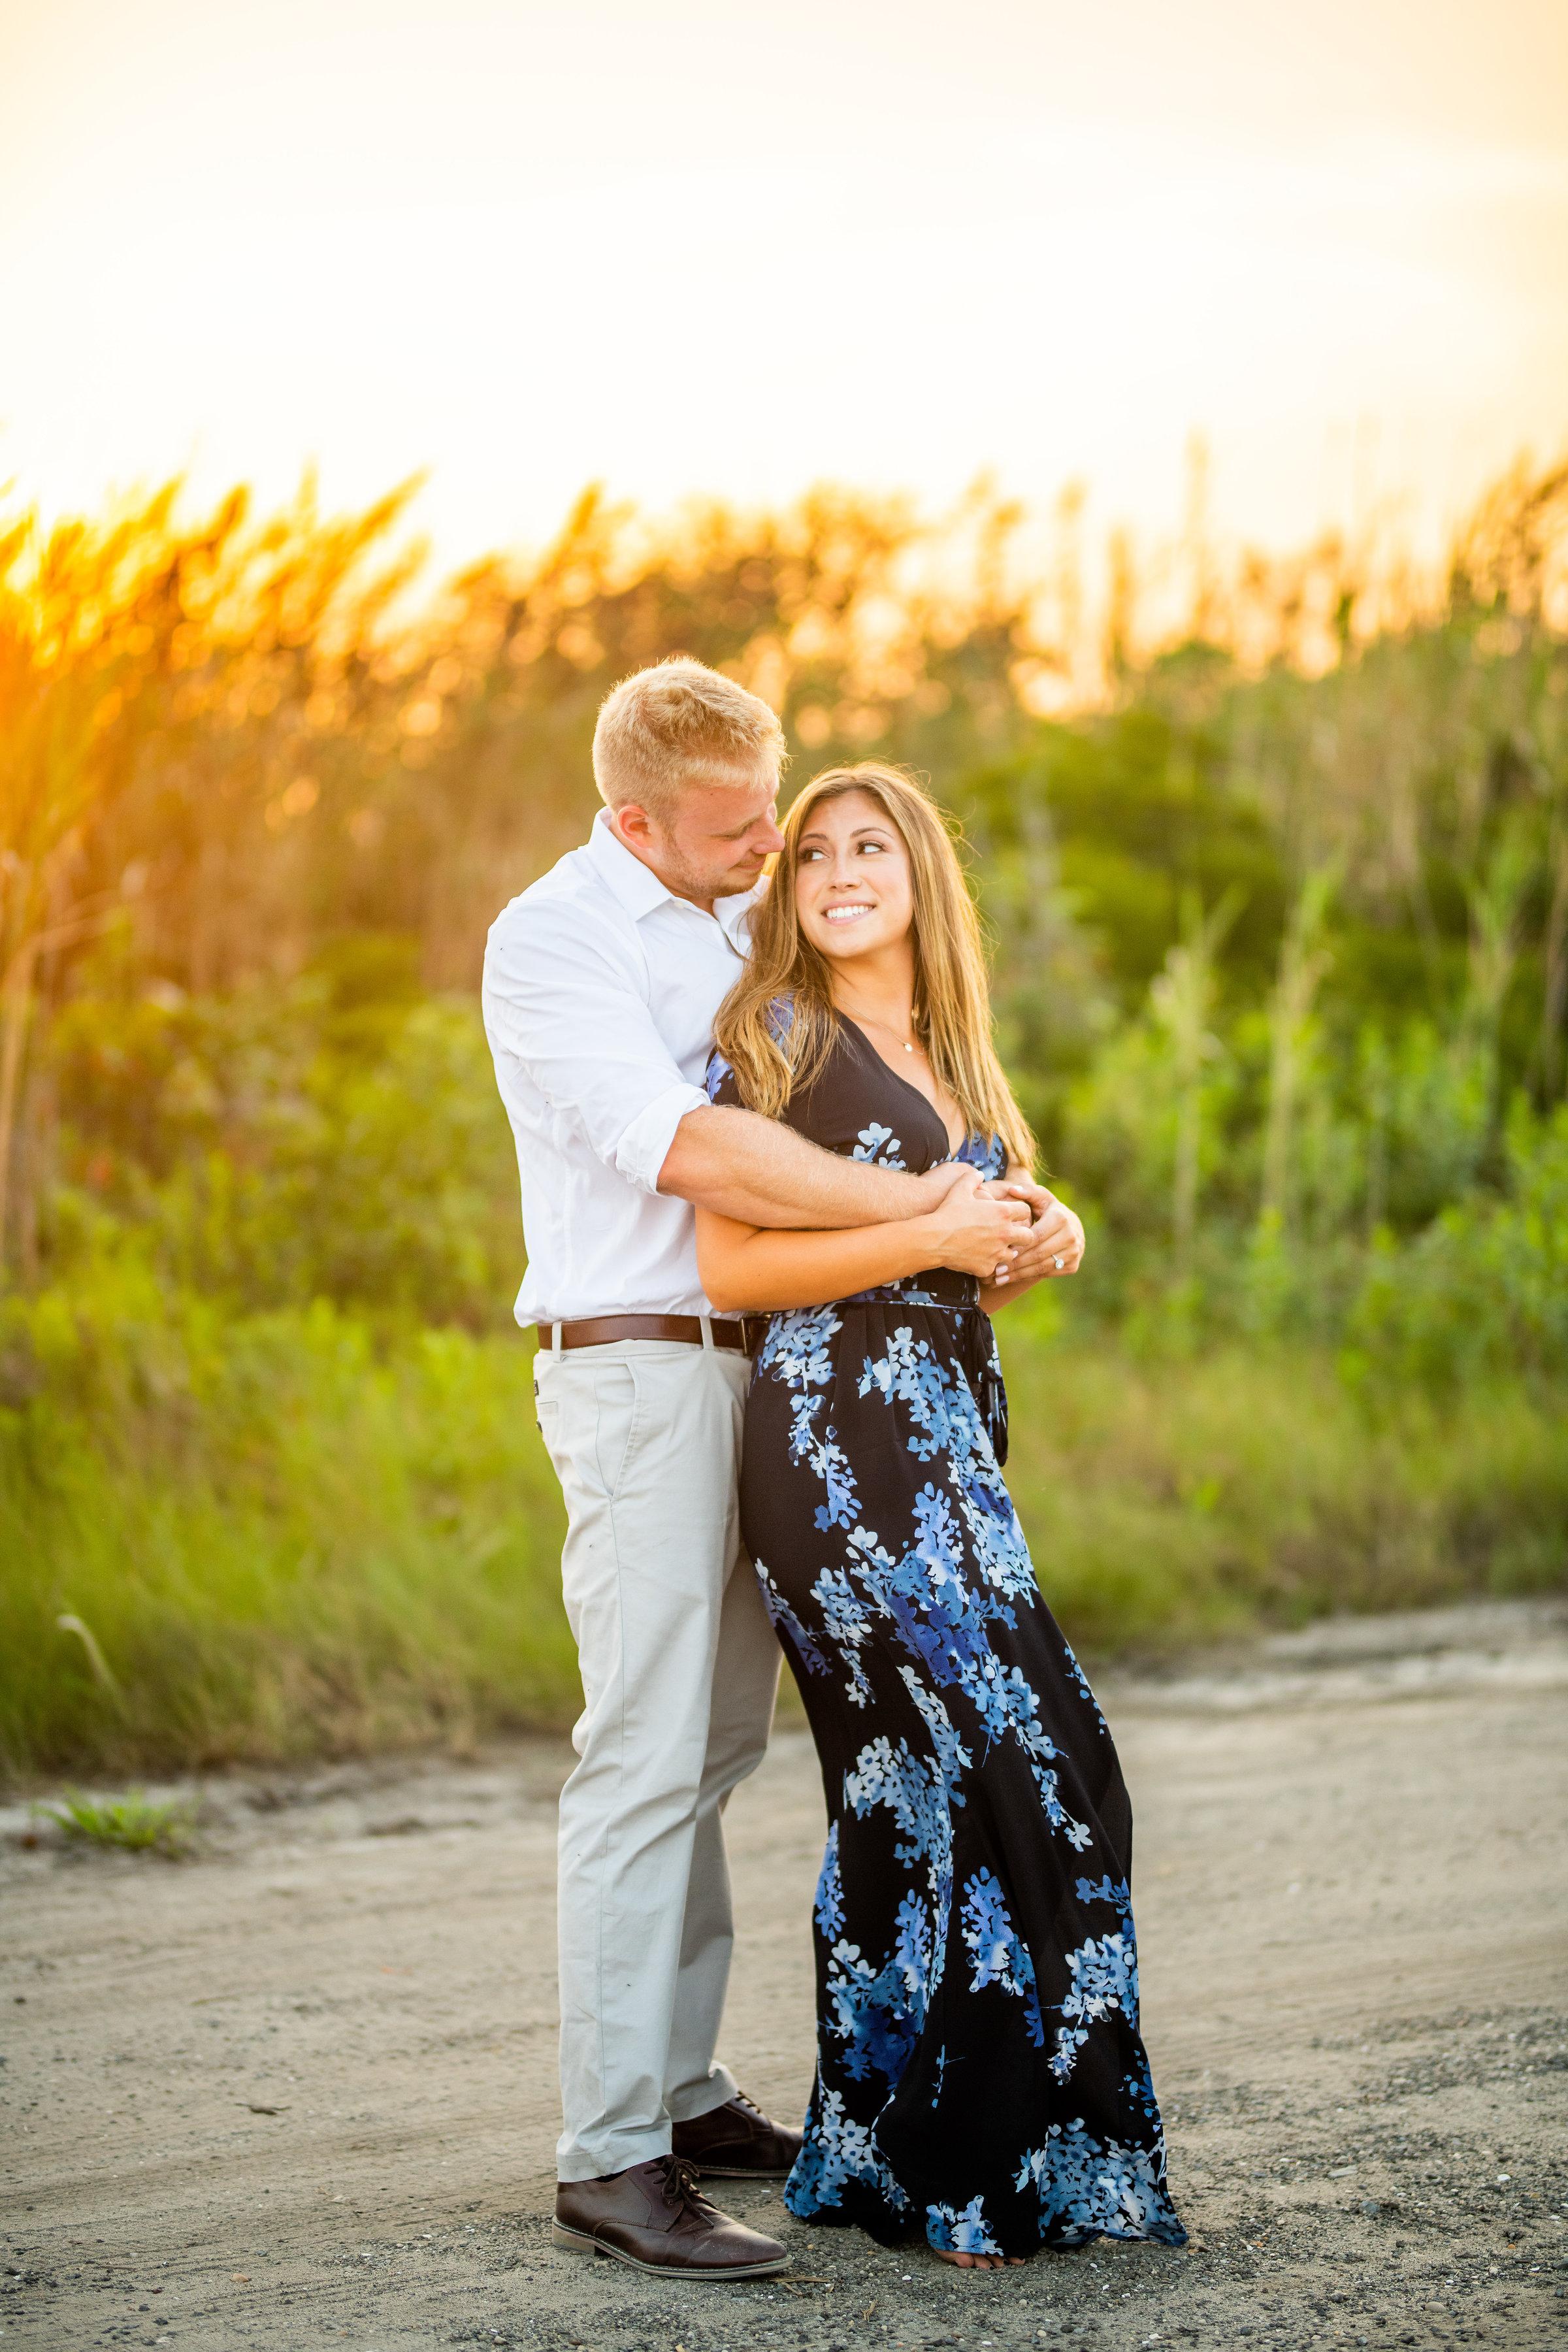 Dune Road Engagement Shoot | Westhampton Beach Engagement Shoot | Hamptons Wedding Photographer18